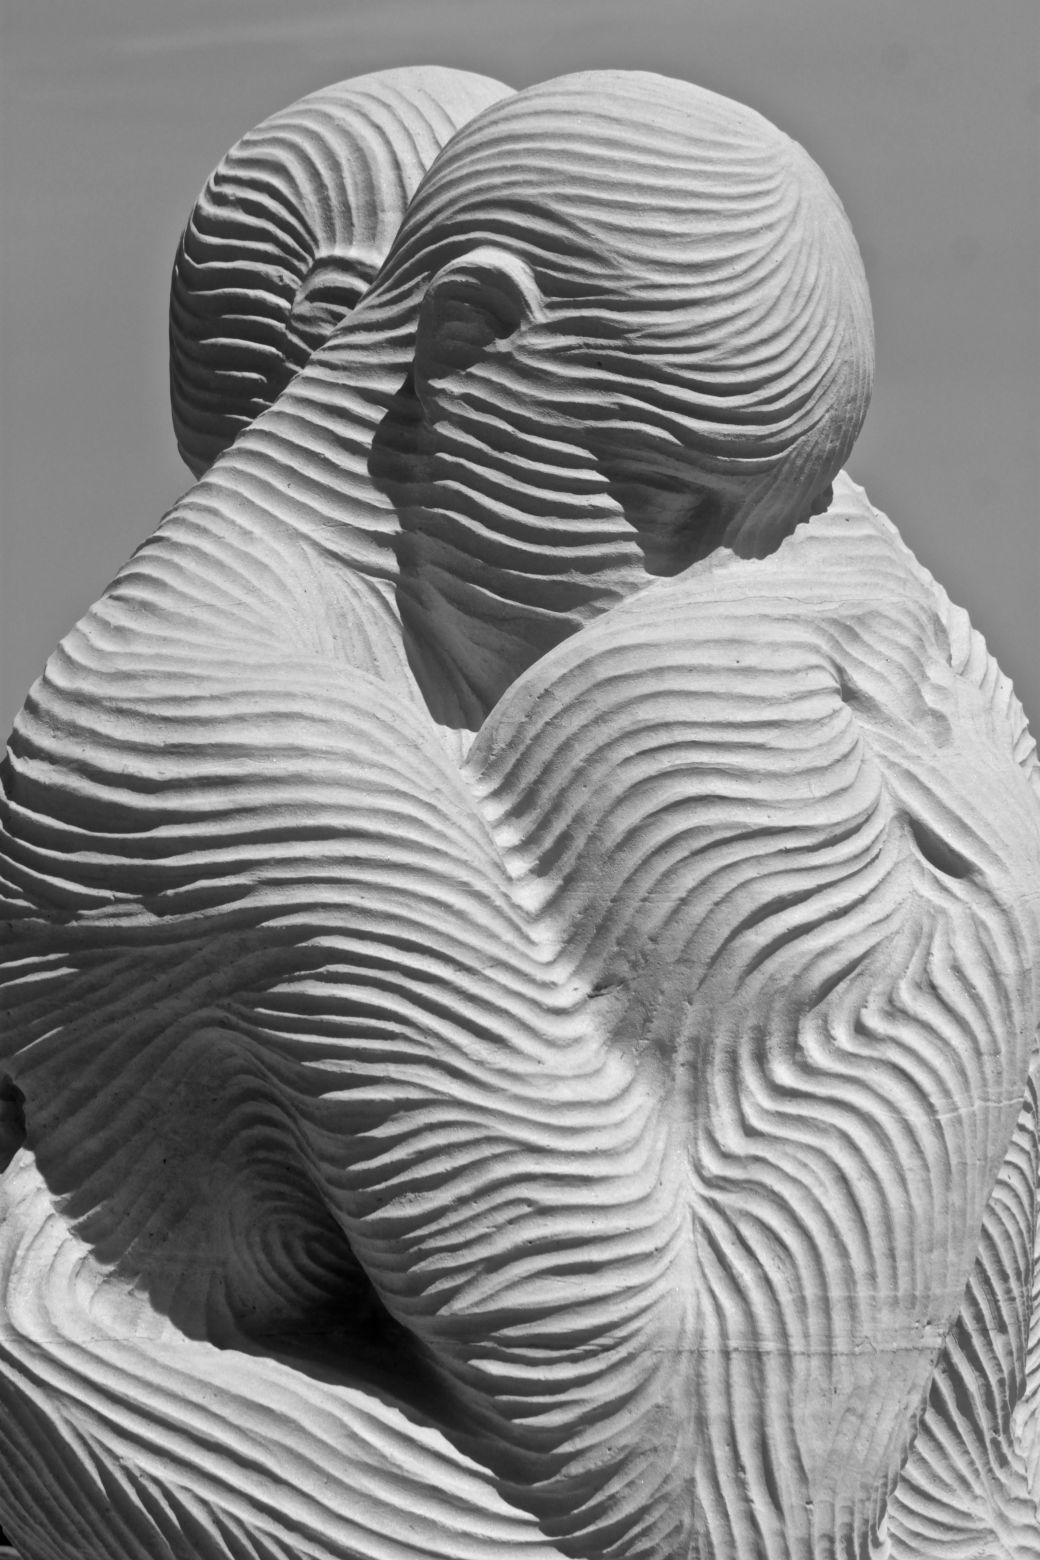 boston revere beach National Sand Sculpting Festival people embracing sand sculpture 2